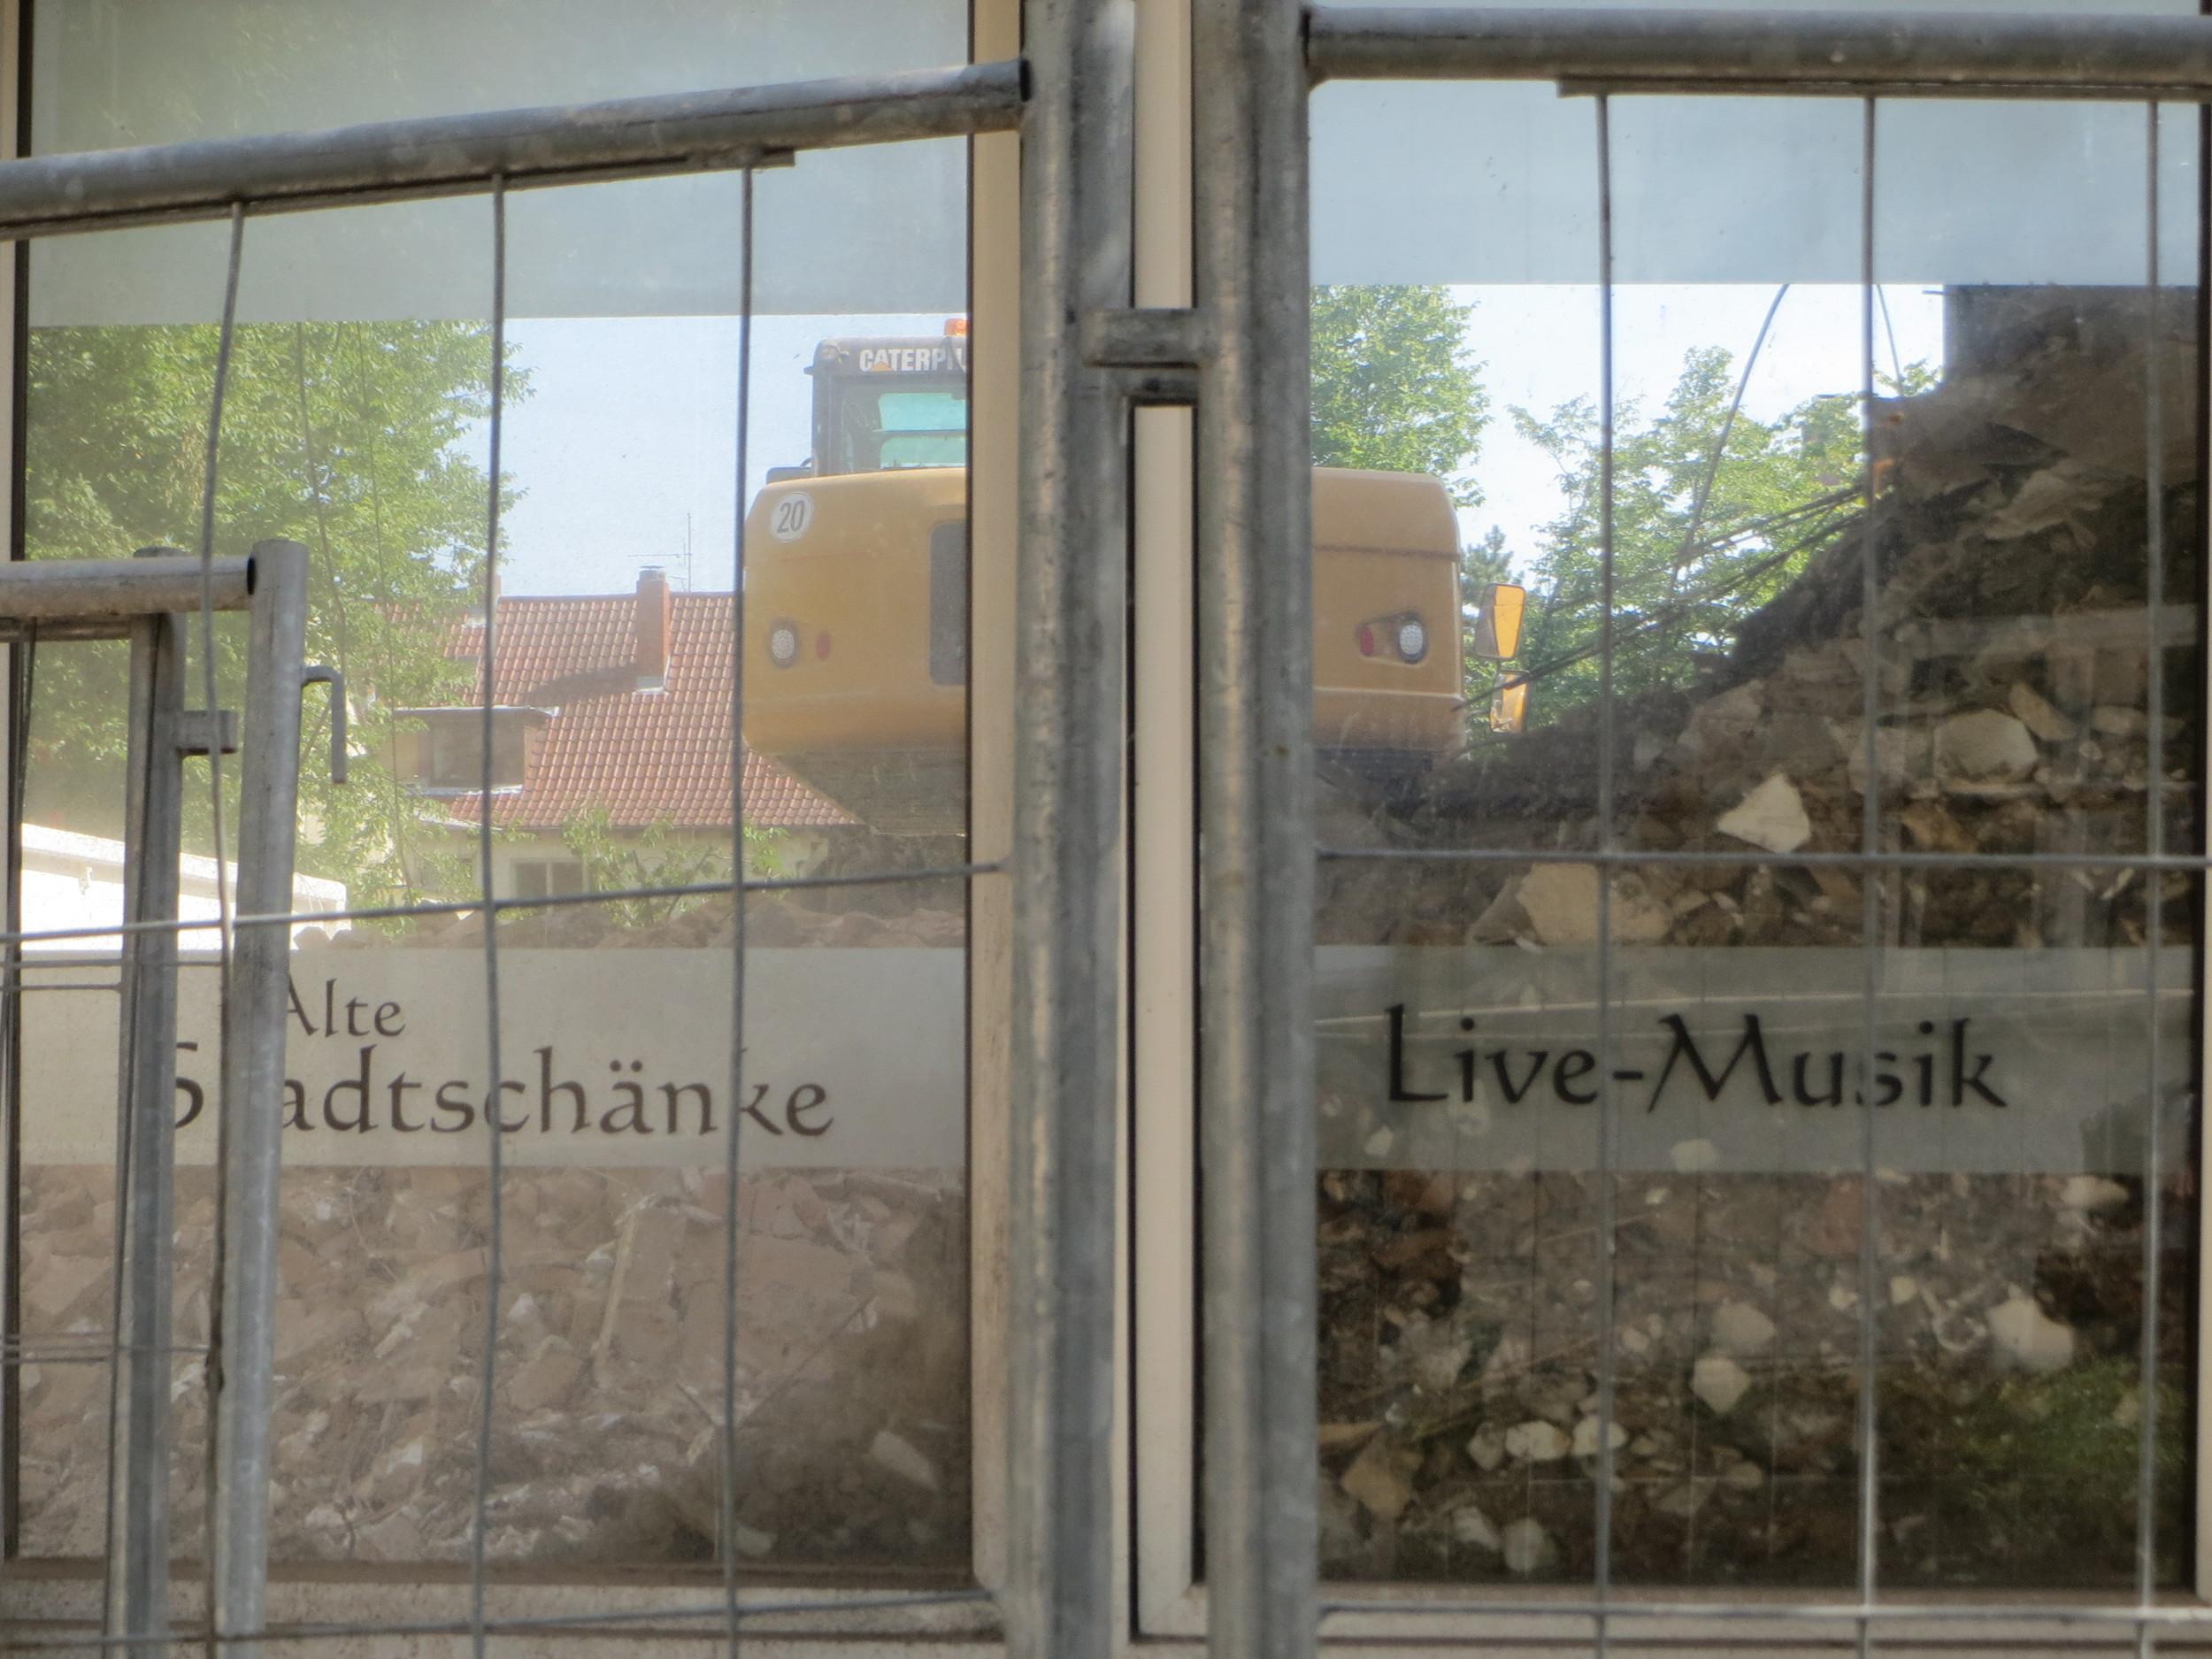 File:20140719Alte Stadtschaenke Hockenheim7.jpg - Wikimedia Commons